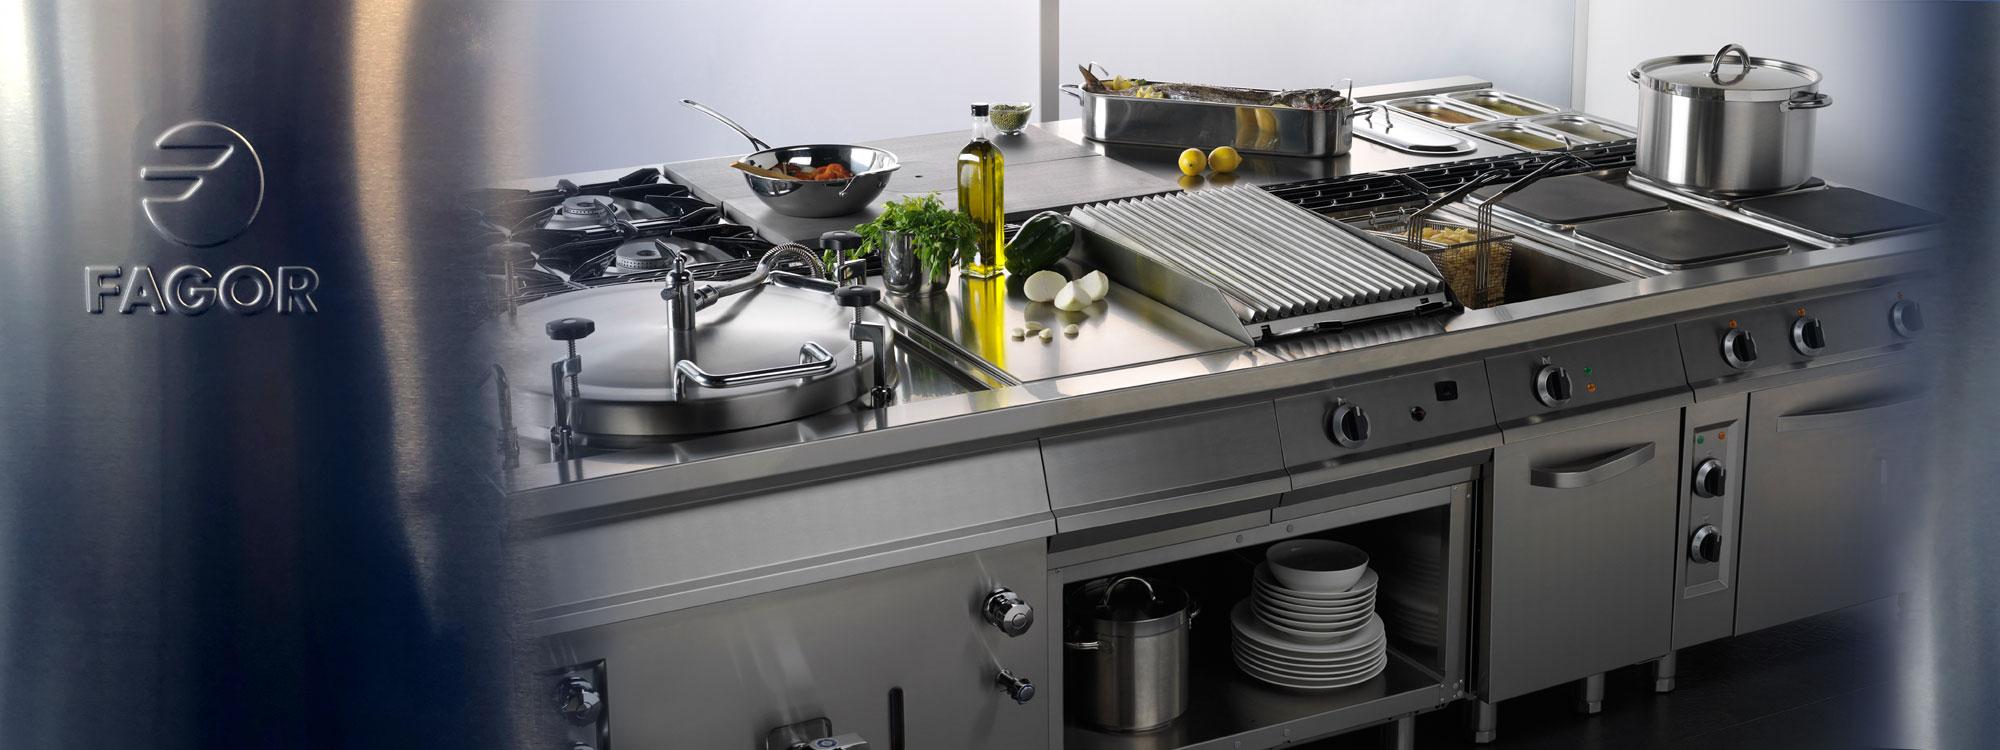 fabrication-customised-professional-kitchen-design